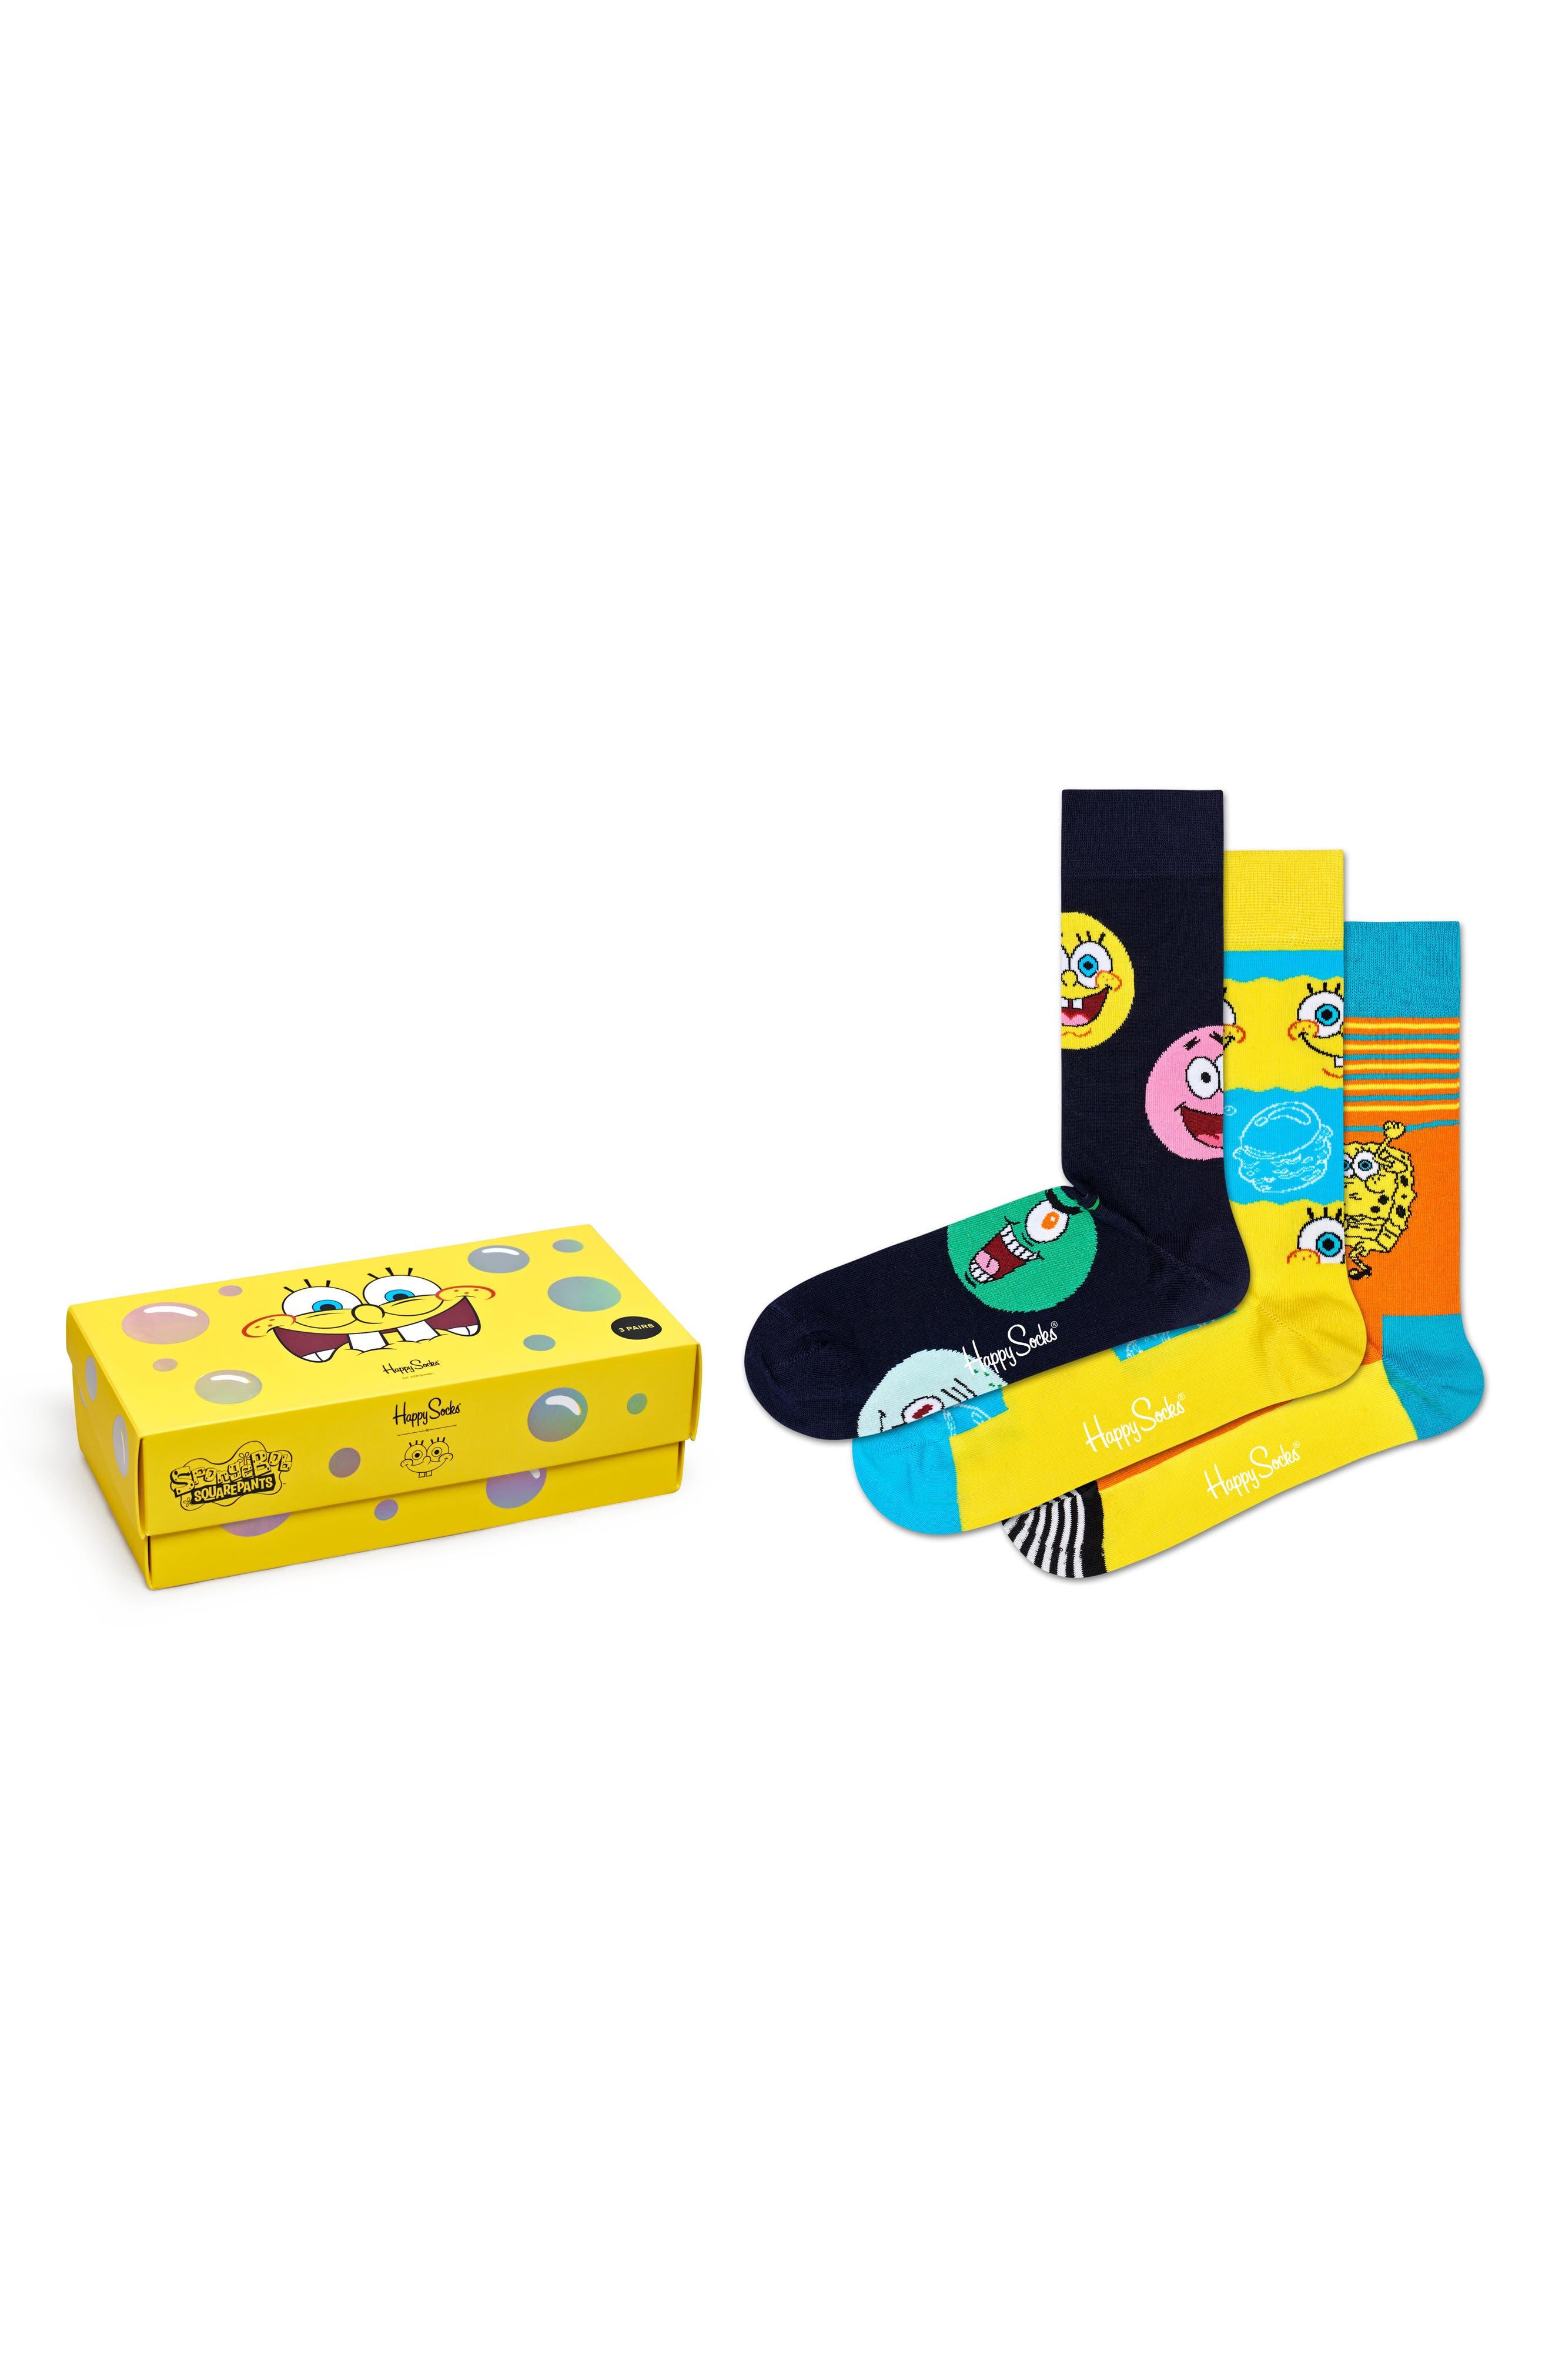 X Spongebob 3-Pack Socks